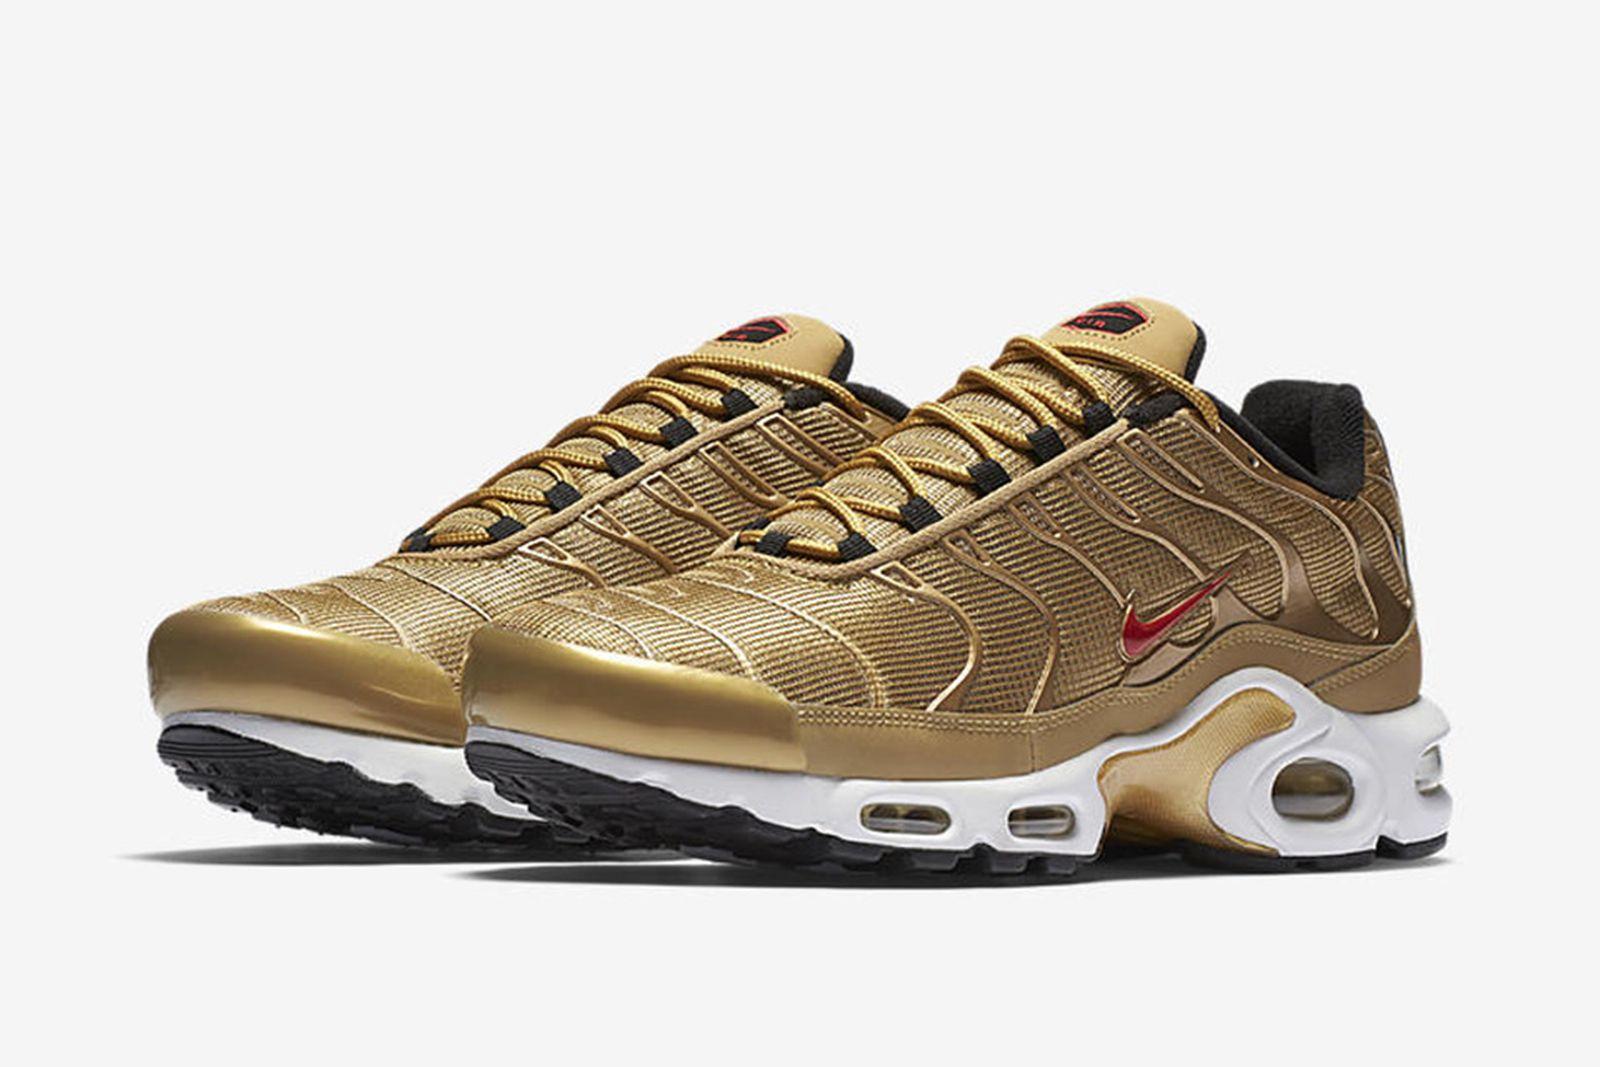 nike-air-vapormax-97-metallic-gold-release-price-08